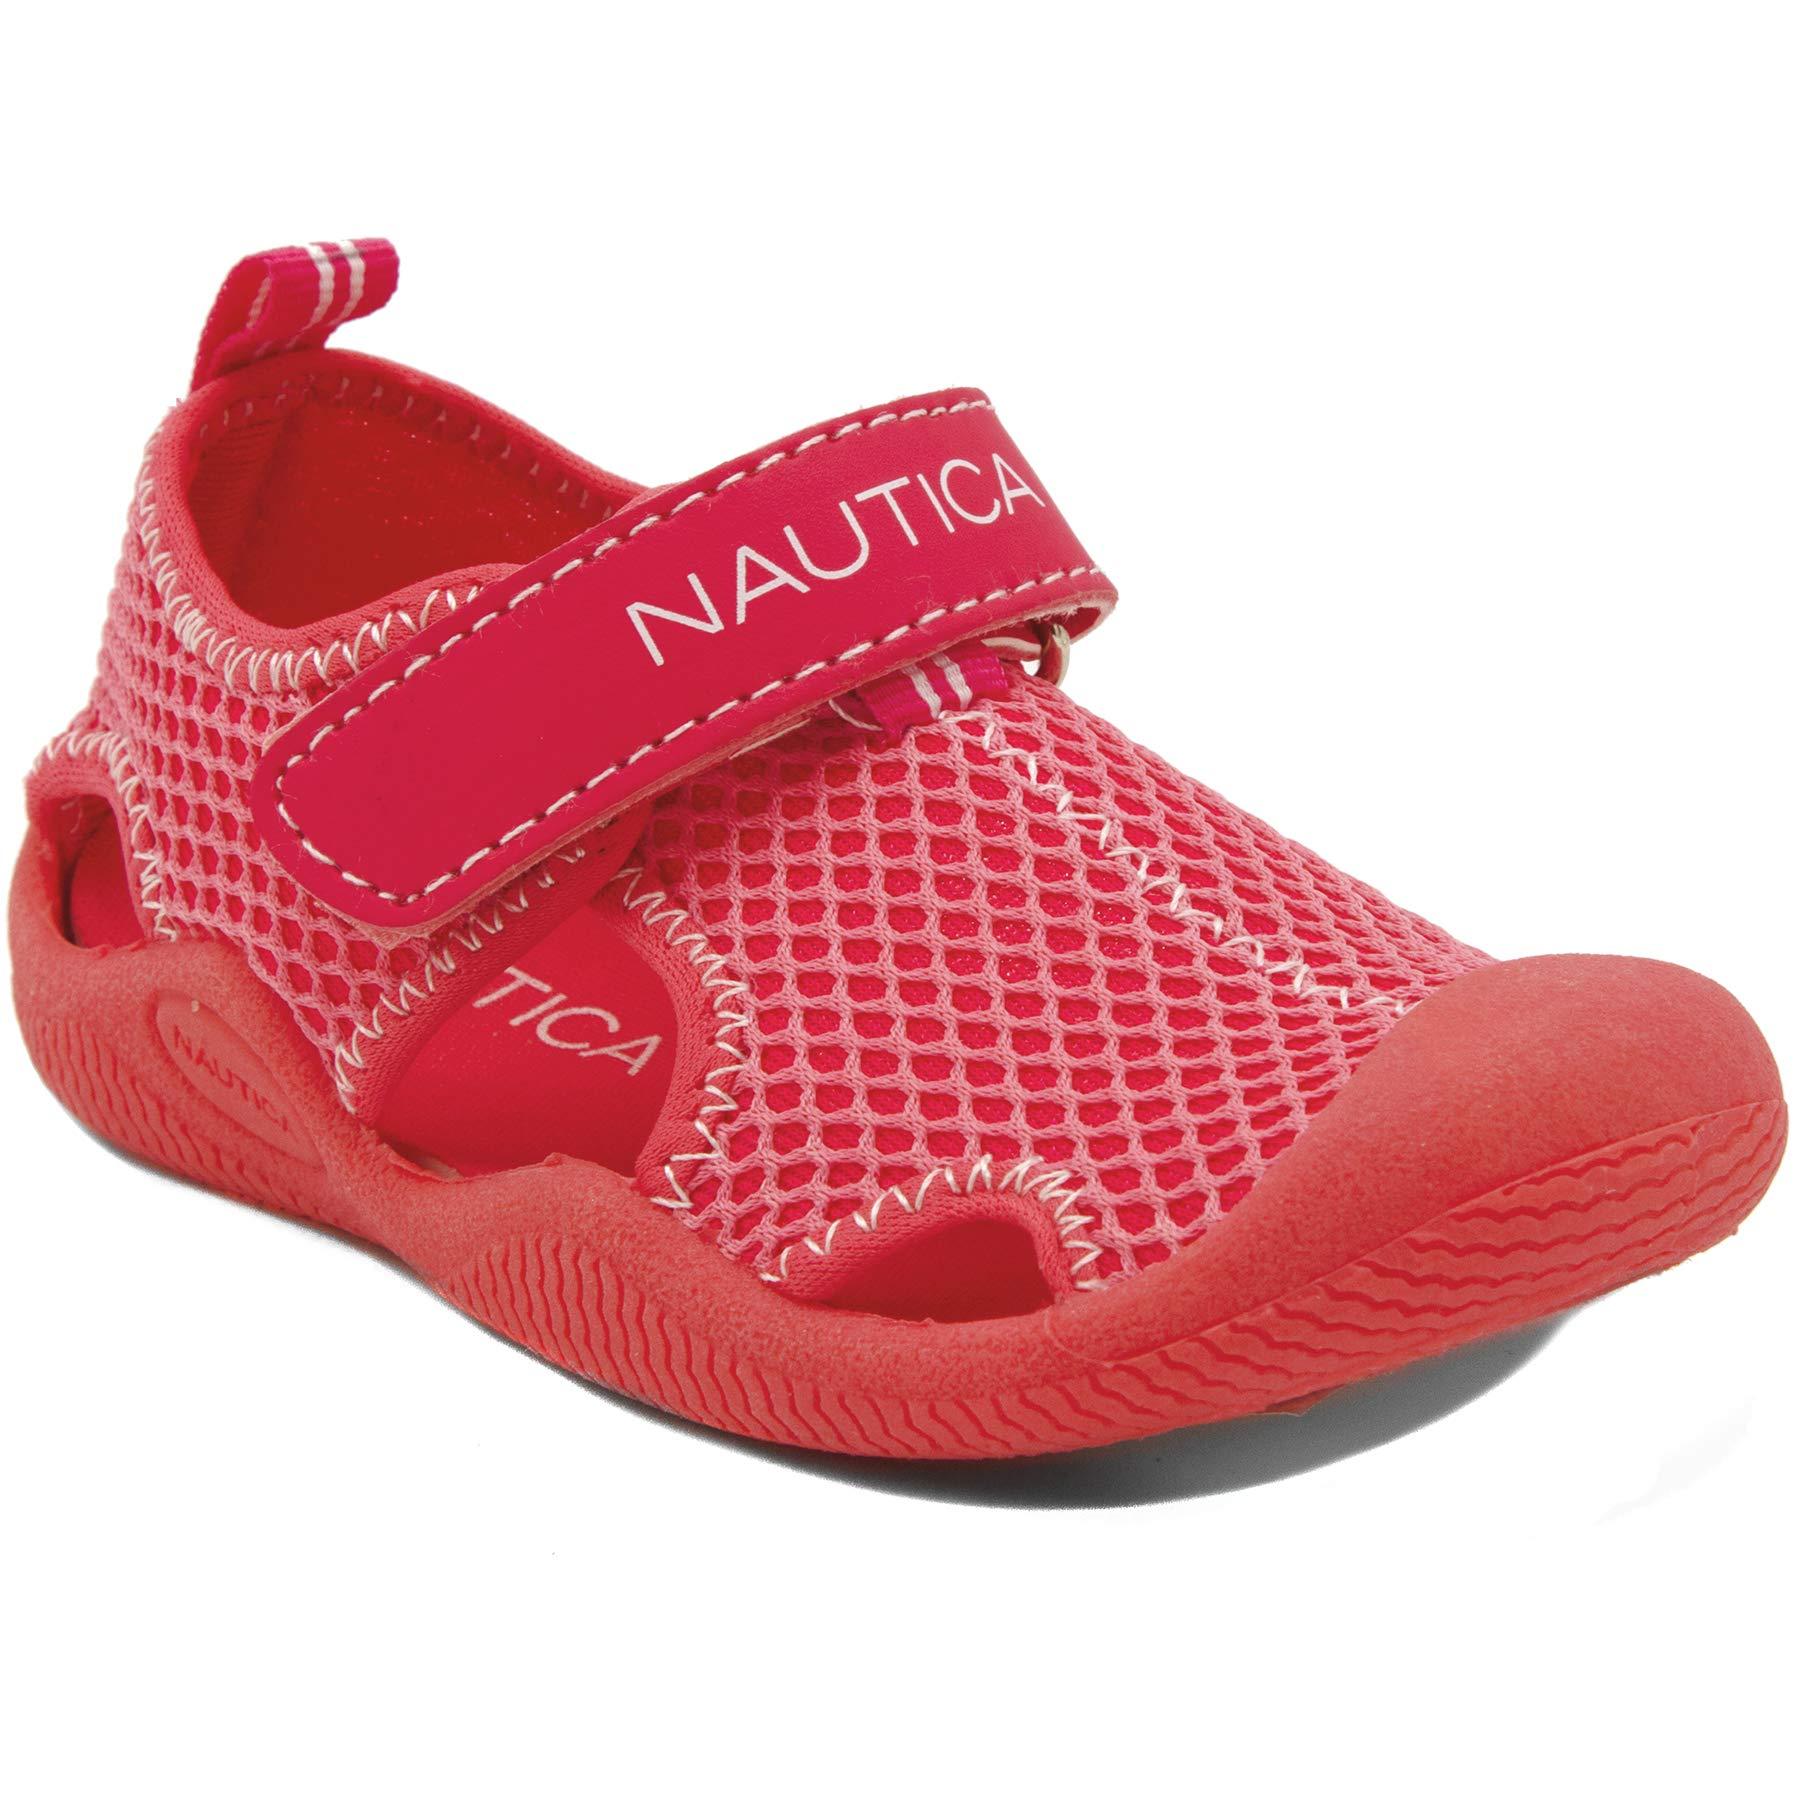 Nautica Kids Kettle Gulf Protective Water Shoe,Closed-Toe Sport Sandal-Pink/LT Pink-7